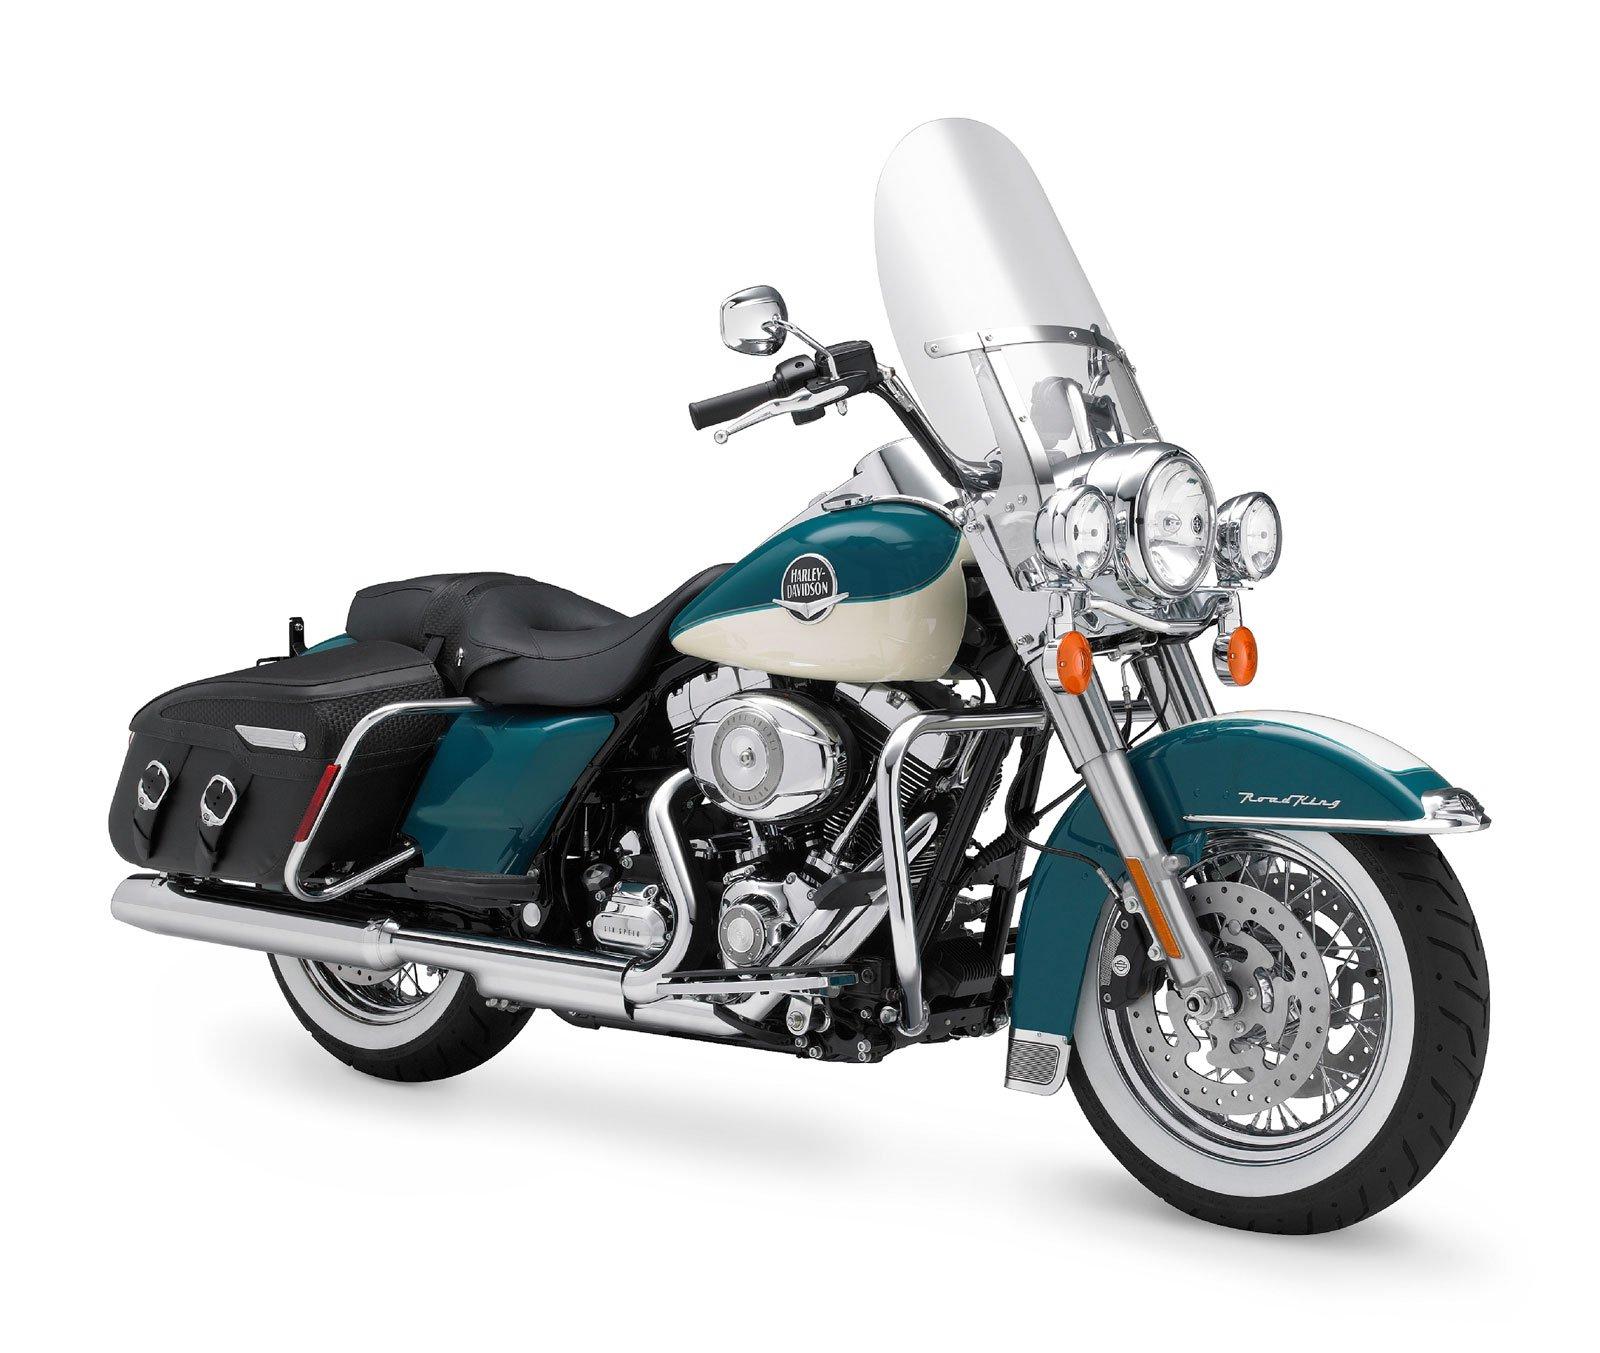 2009 harley davidson touring family motorcycle reviews. Black Bedroom Furniture Sets. Home Design Ideas